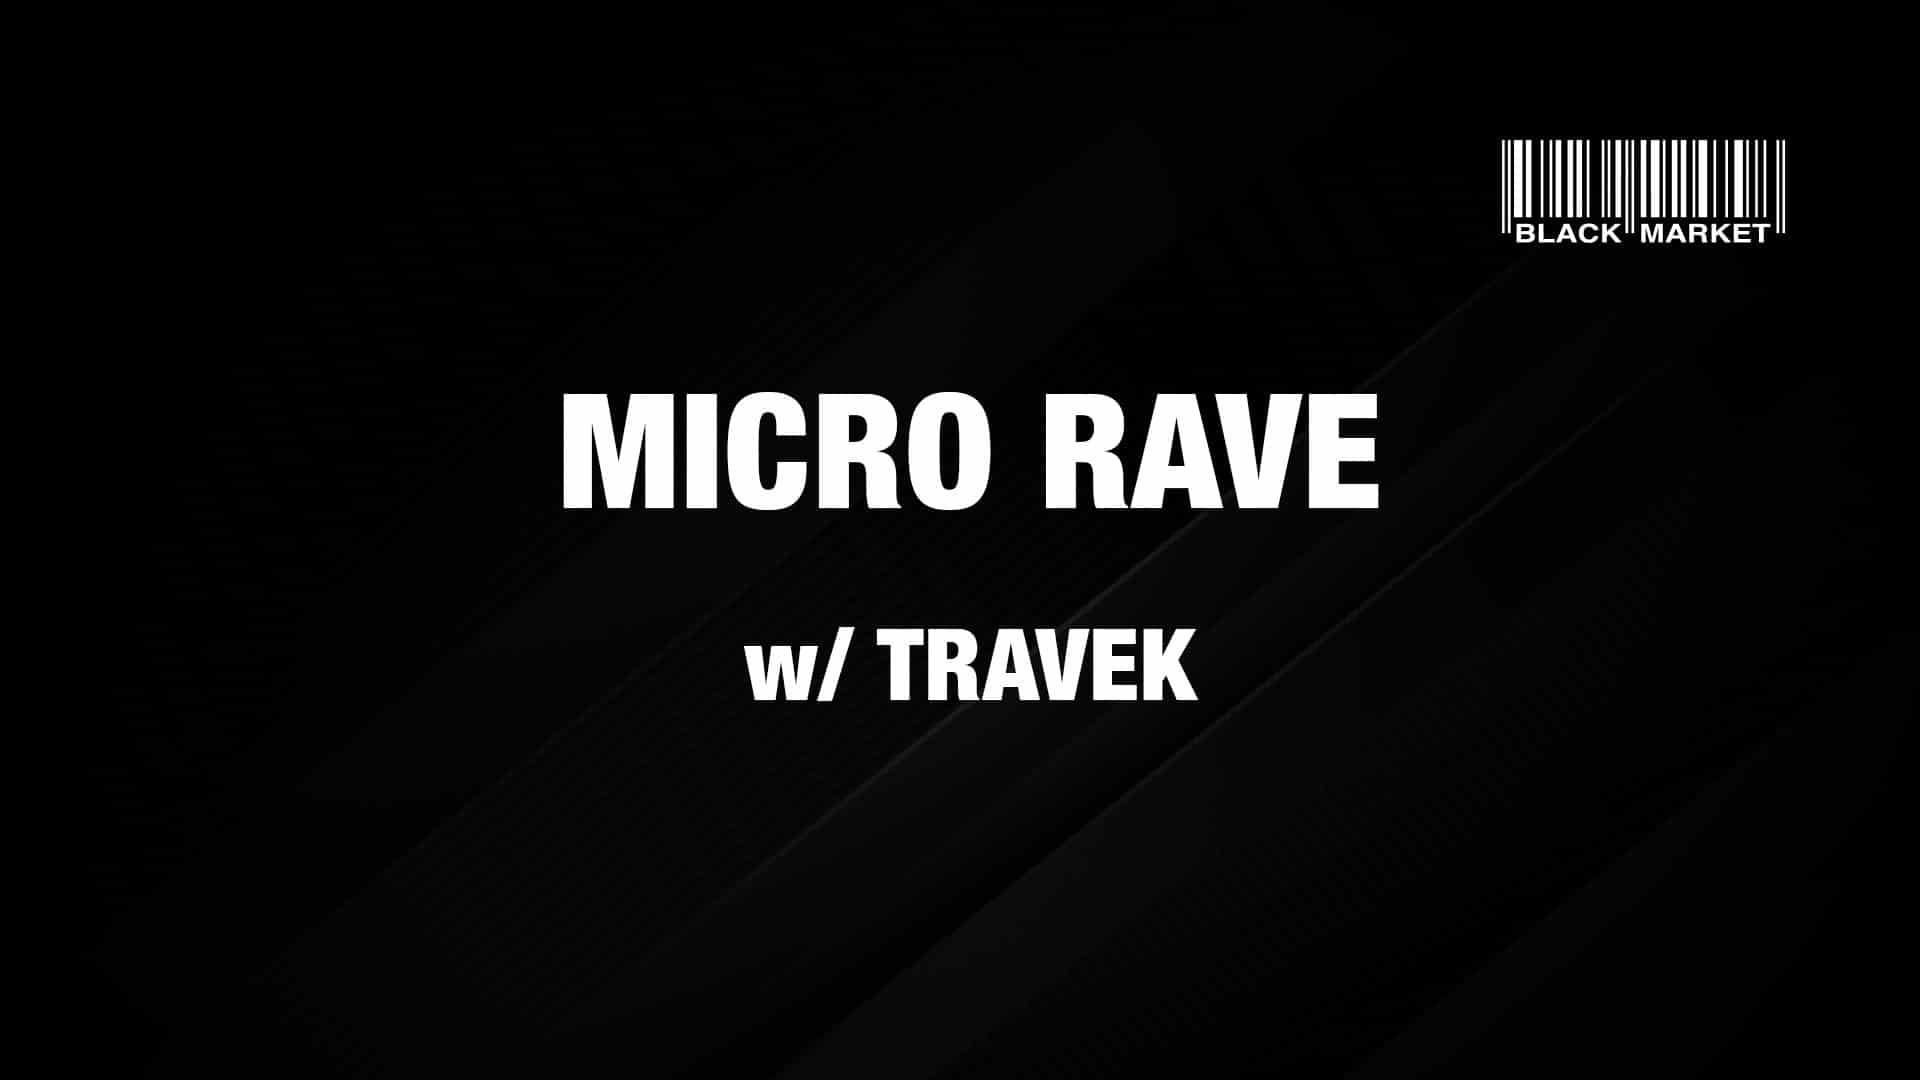 Events Wien: MICRO RAVE #4 w/ TRAVEK